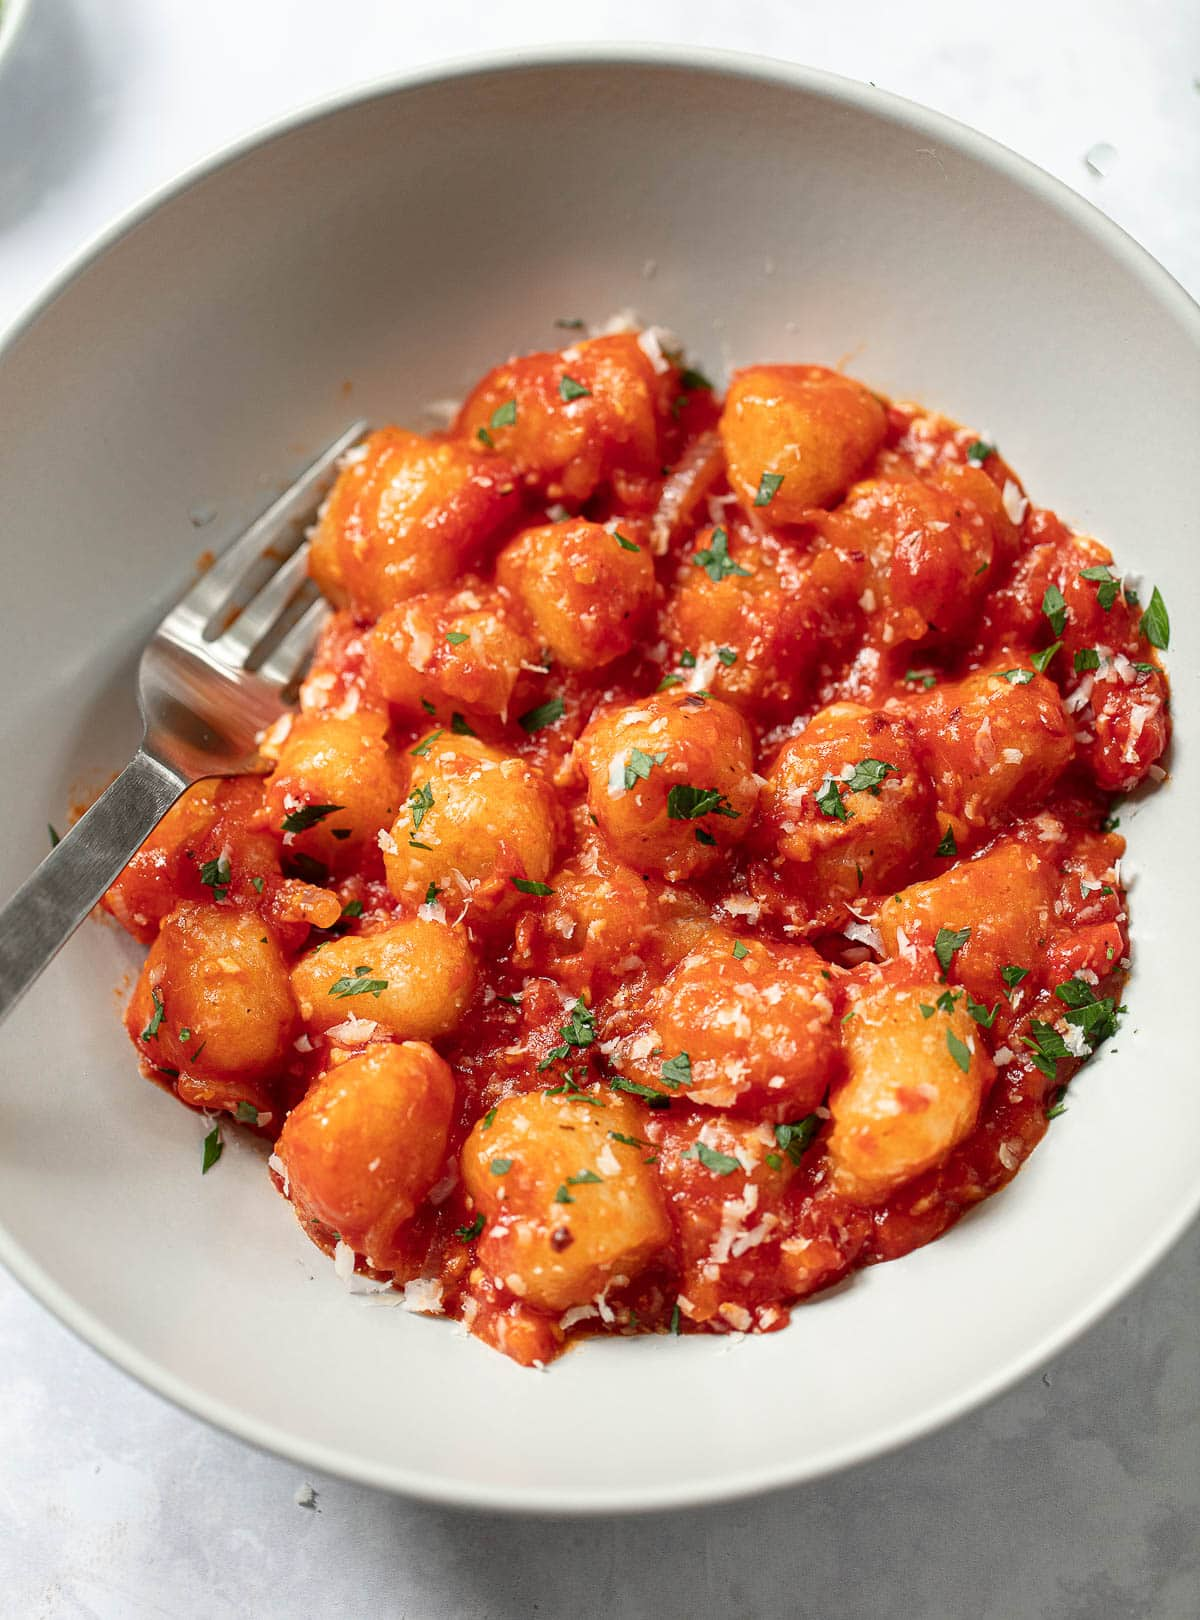 Quick and easy Cauliflower Gnocchi in Spicy Tomato Sauce